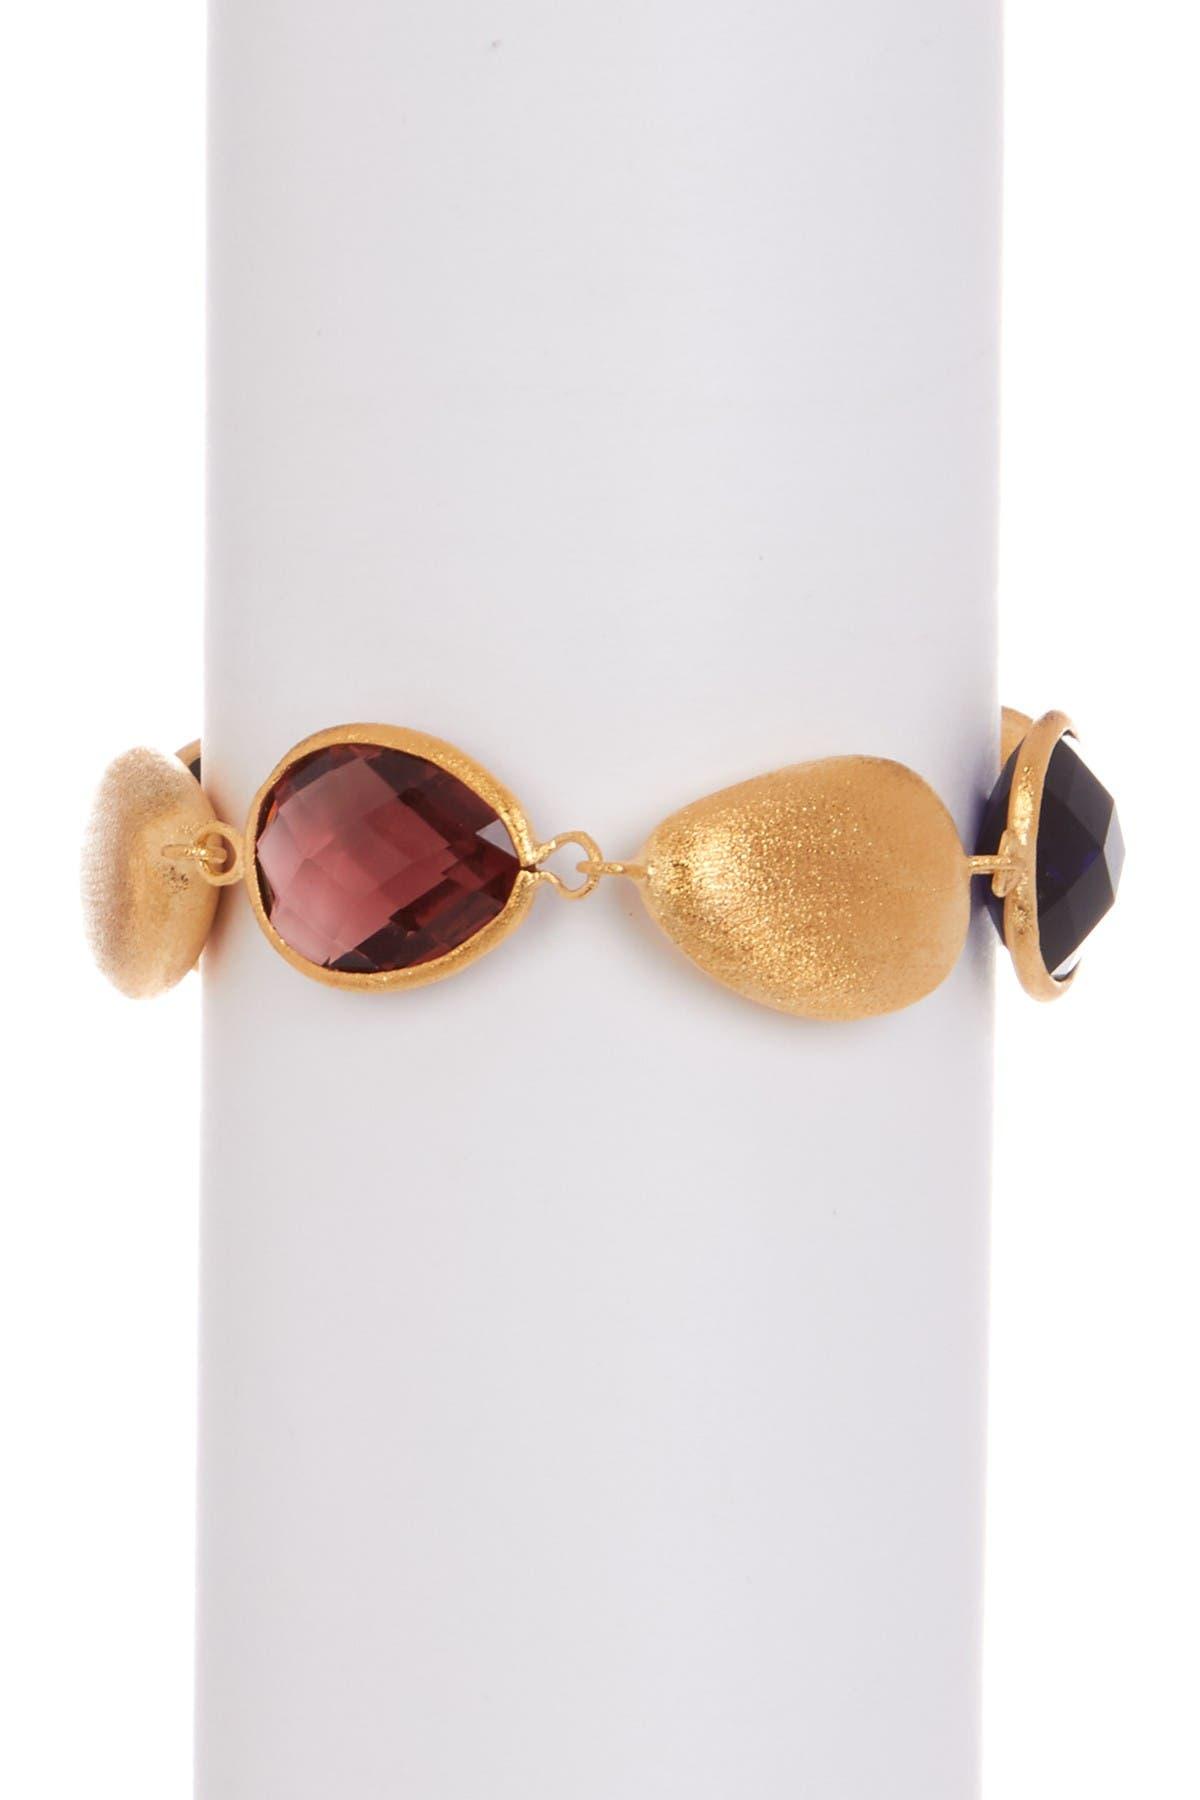 Image of Rivka Friedman 18K Gold Faceted Sapphire & Raspberry Crystal Satin Pebble Bracelet